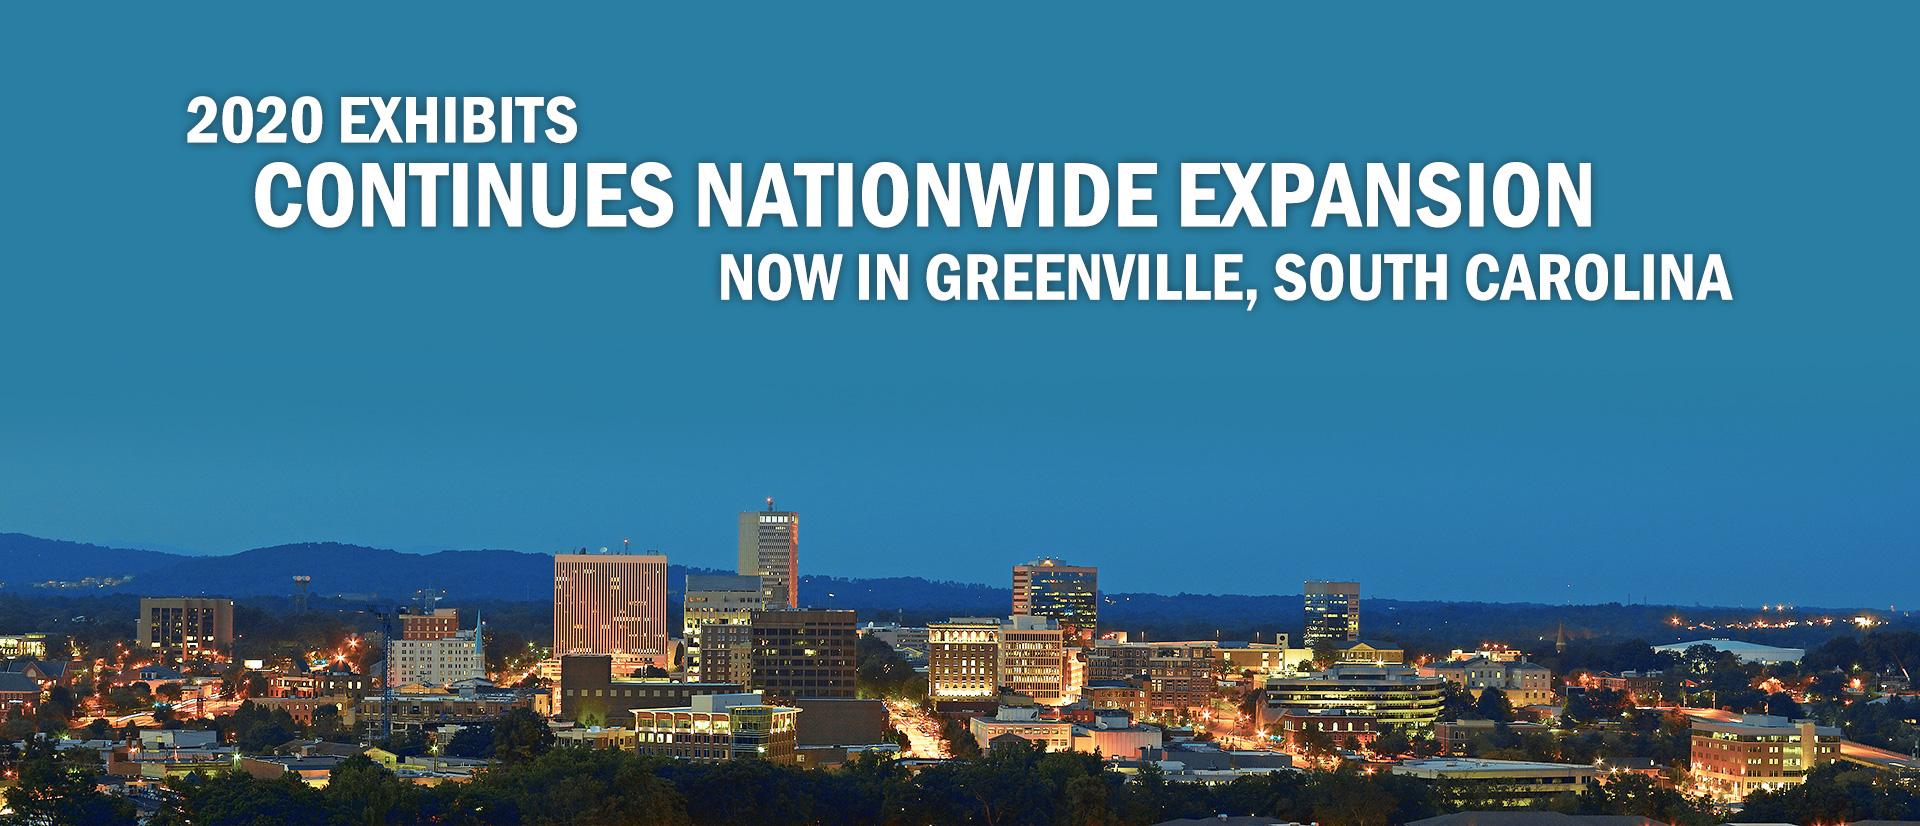 2020 Exhibits, South Carolina